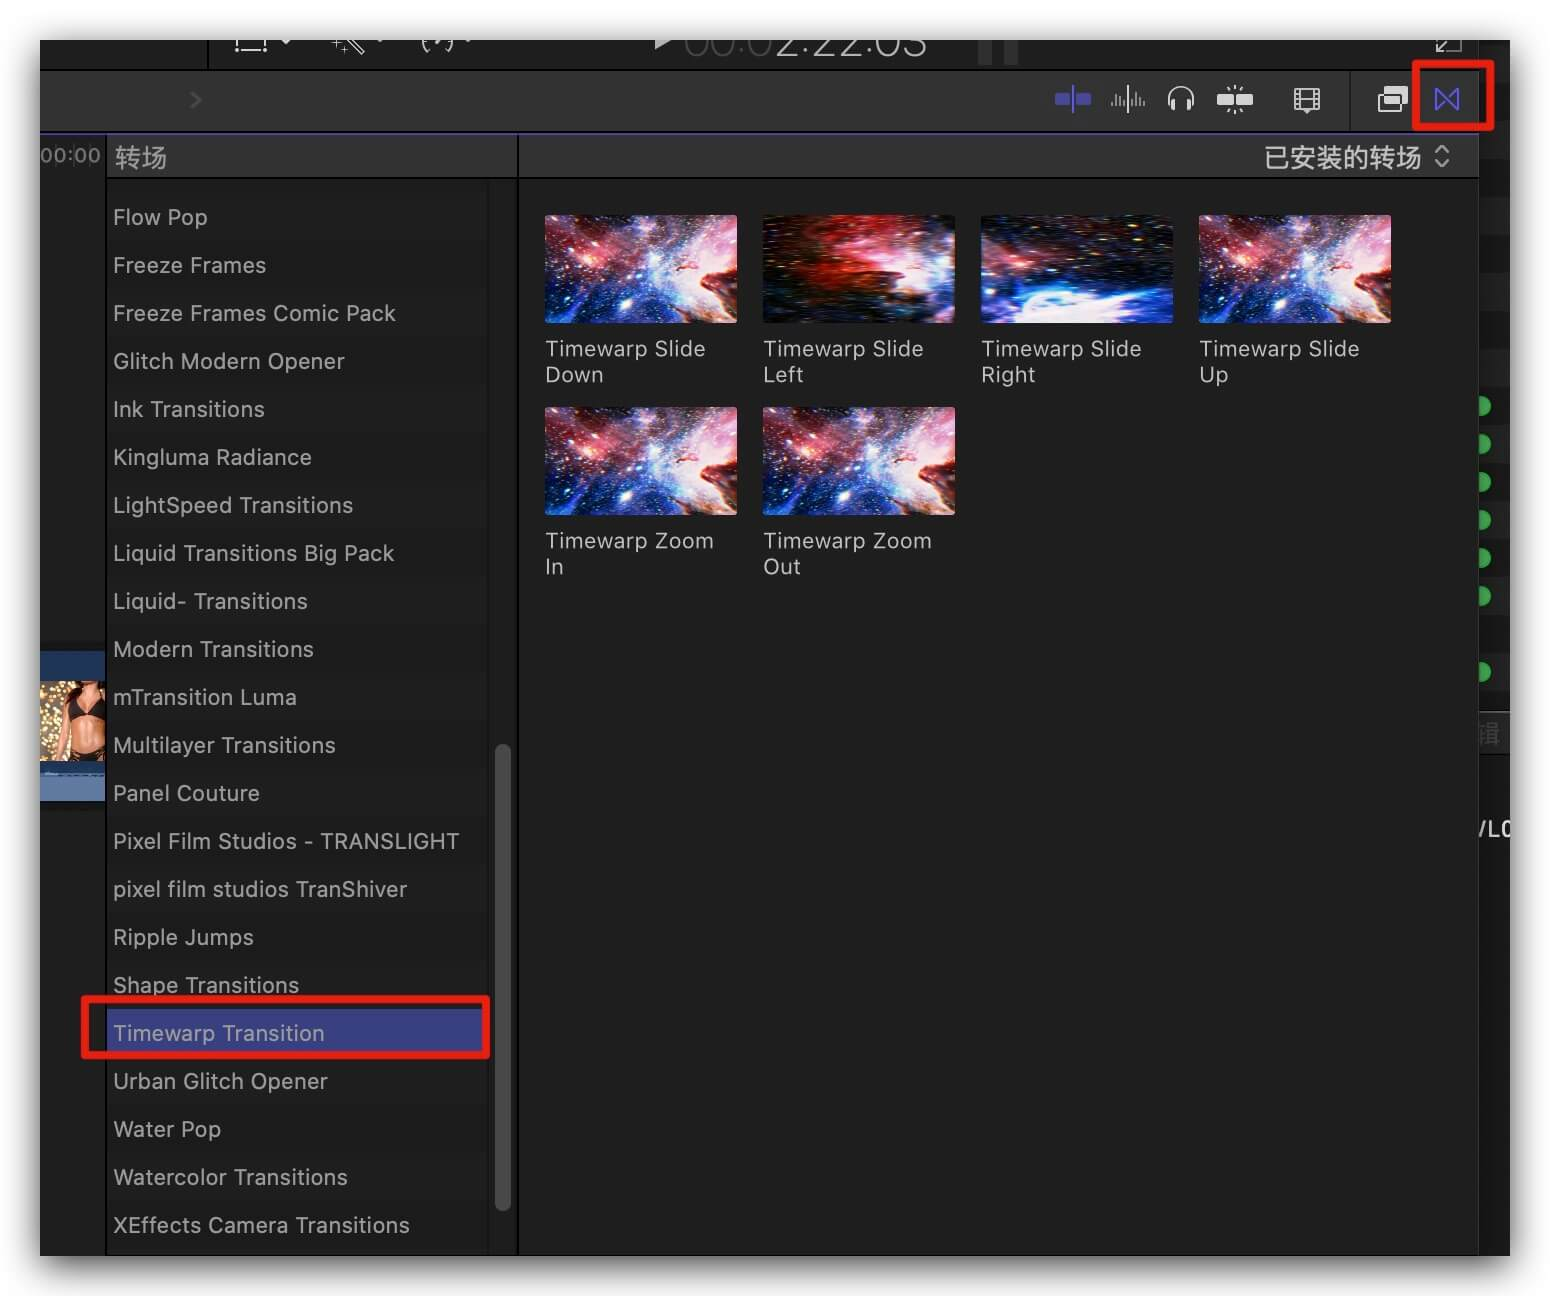 Fcpx插件 6组时间扭曲视频过渡转场预设 Timewarp Transition